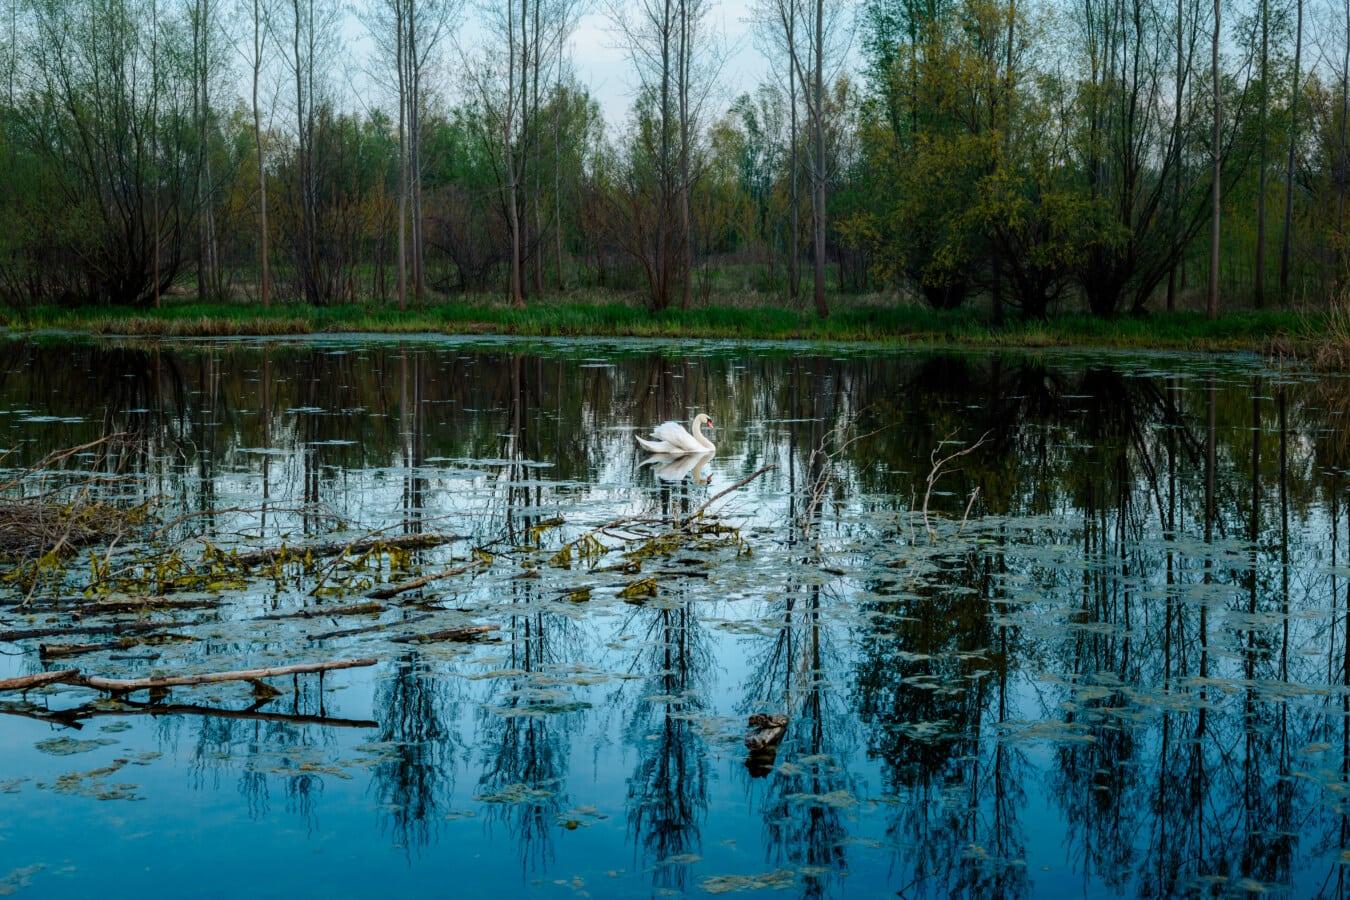 swan, spring time, swamp, majestic, landscape, tree, land, river, wetland, water